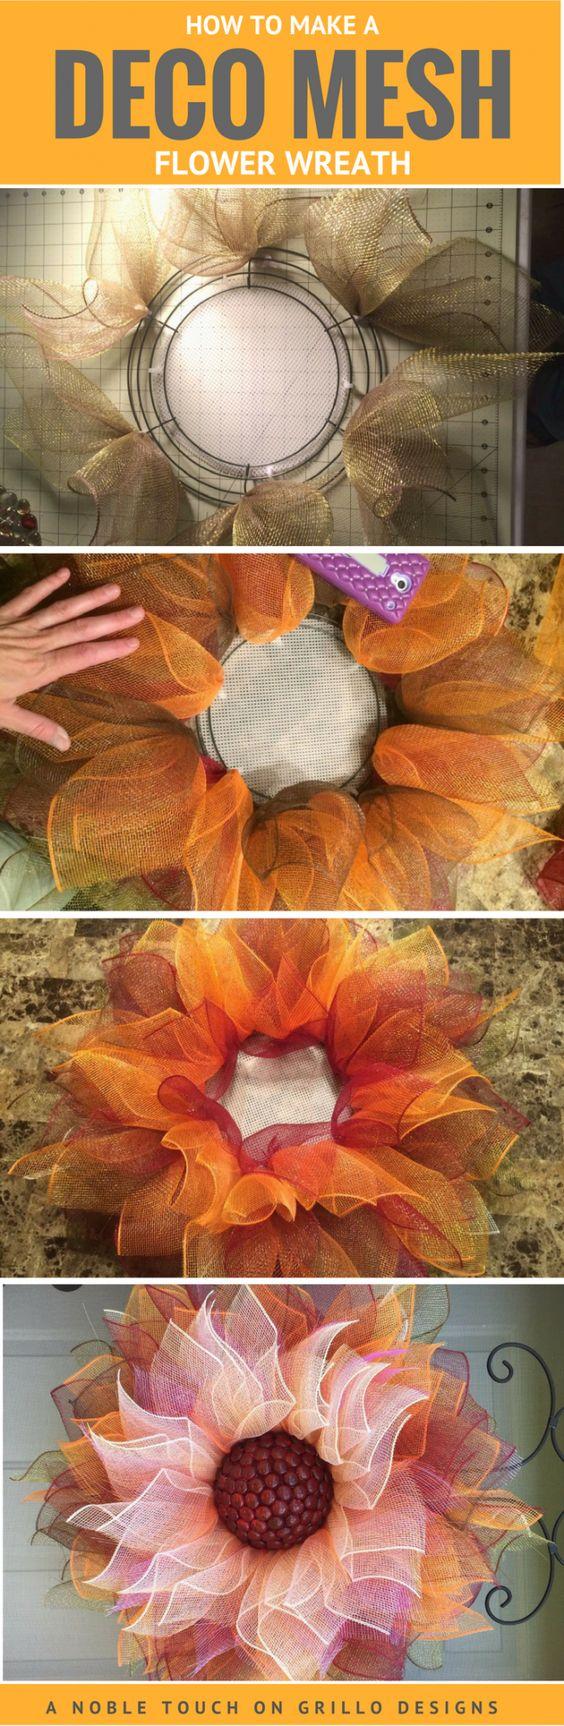 Easy DIY Flower Deco Mesh Wreath.